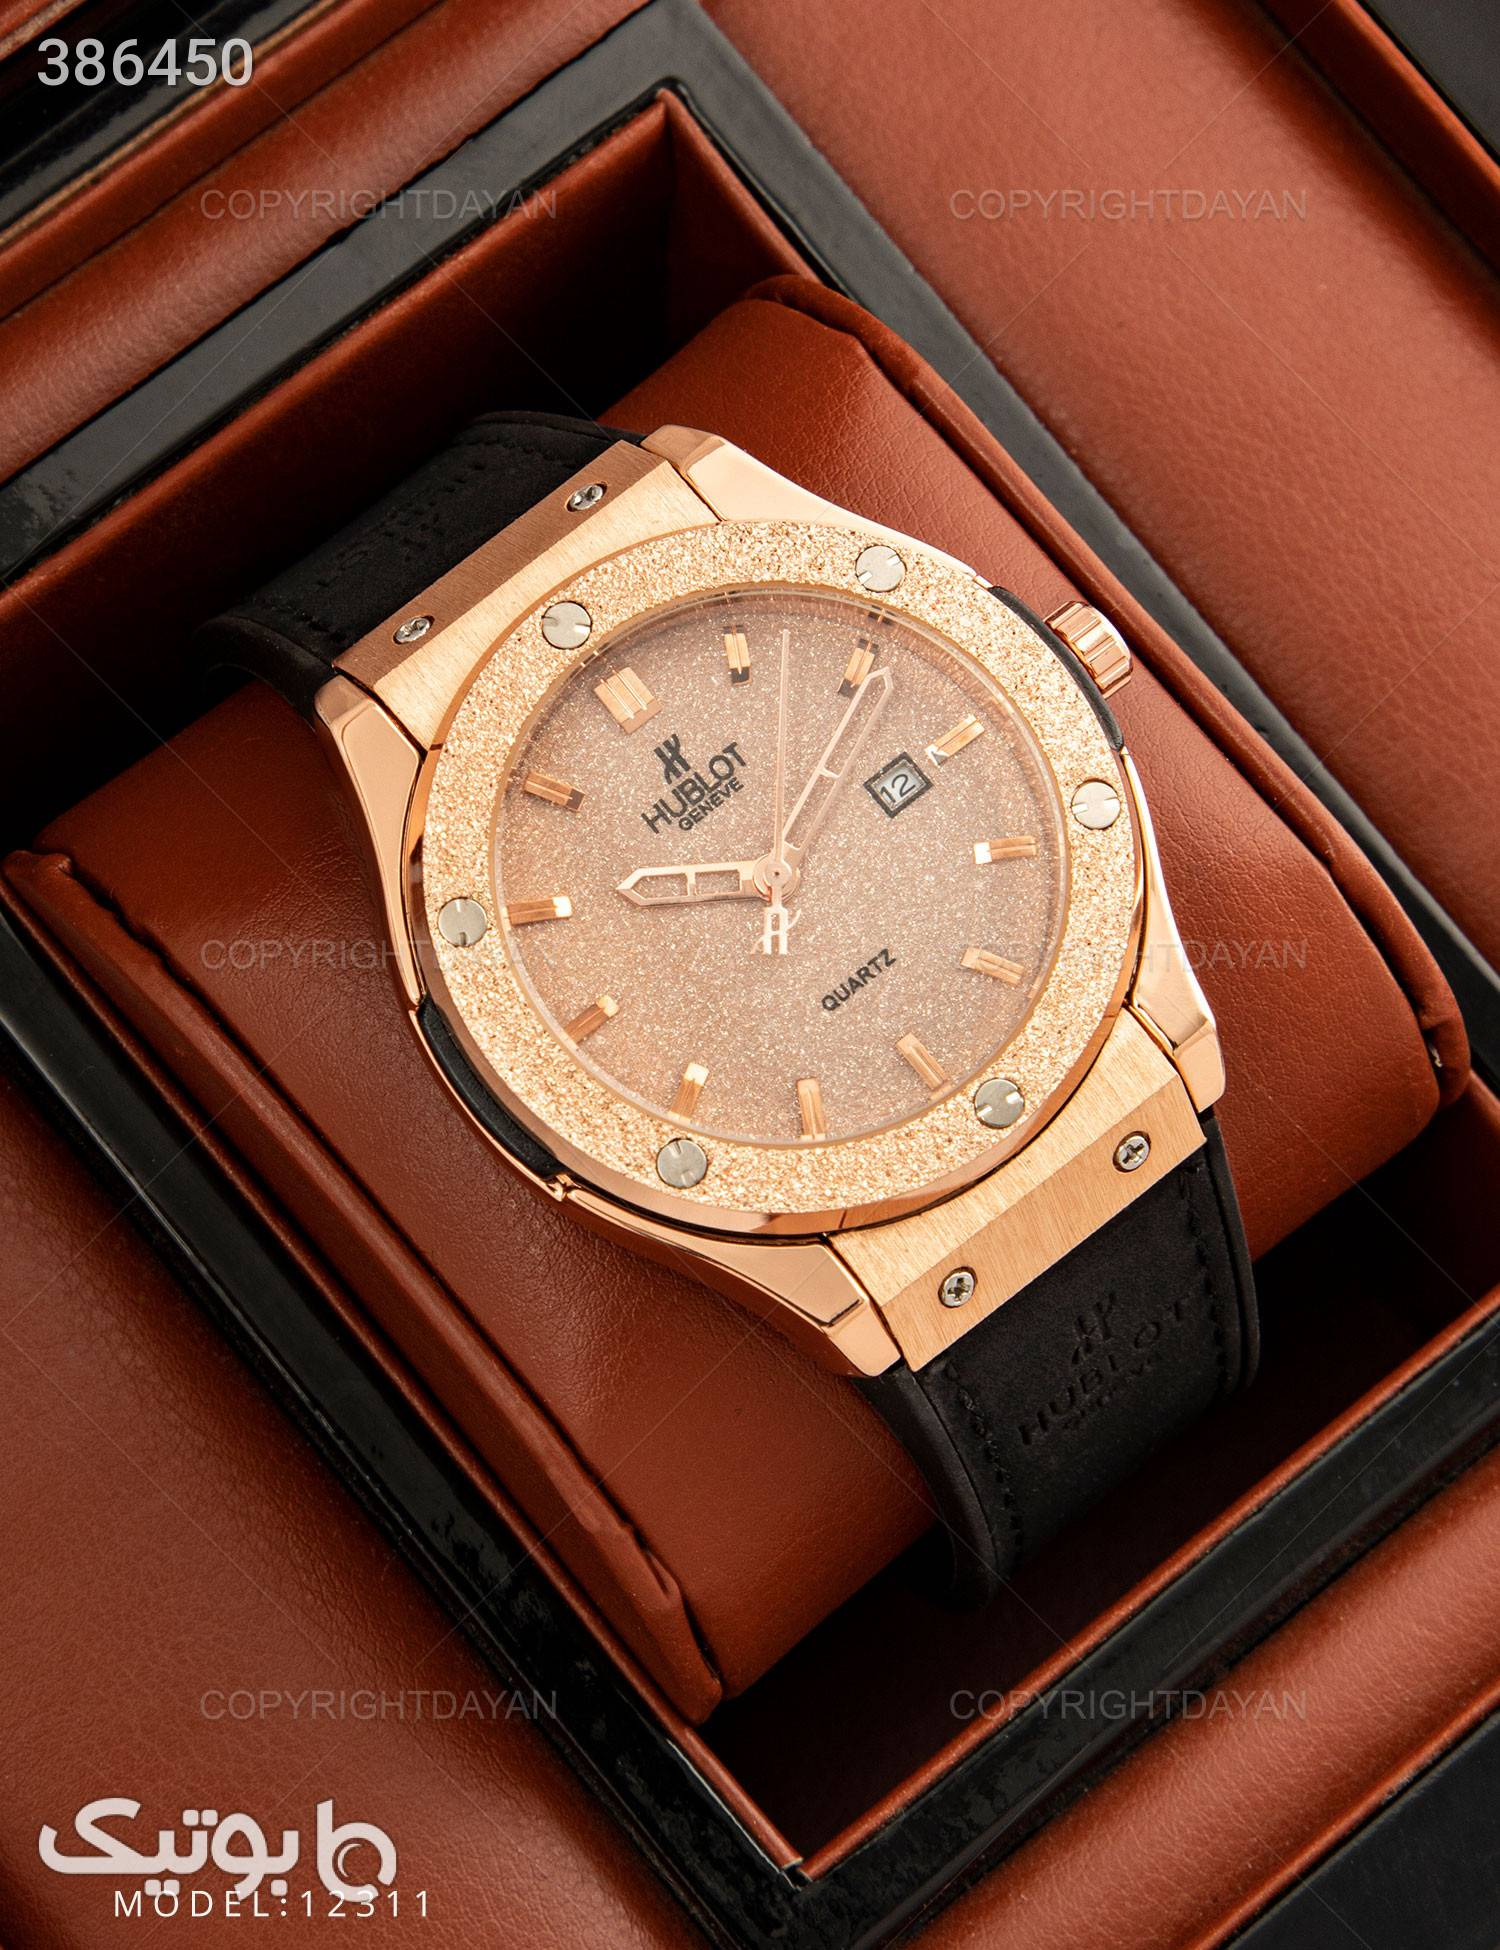 ساعت مچی Hublot مدل 12311 مشکی ساعت